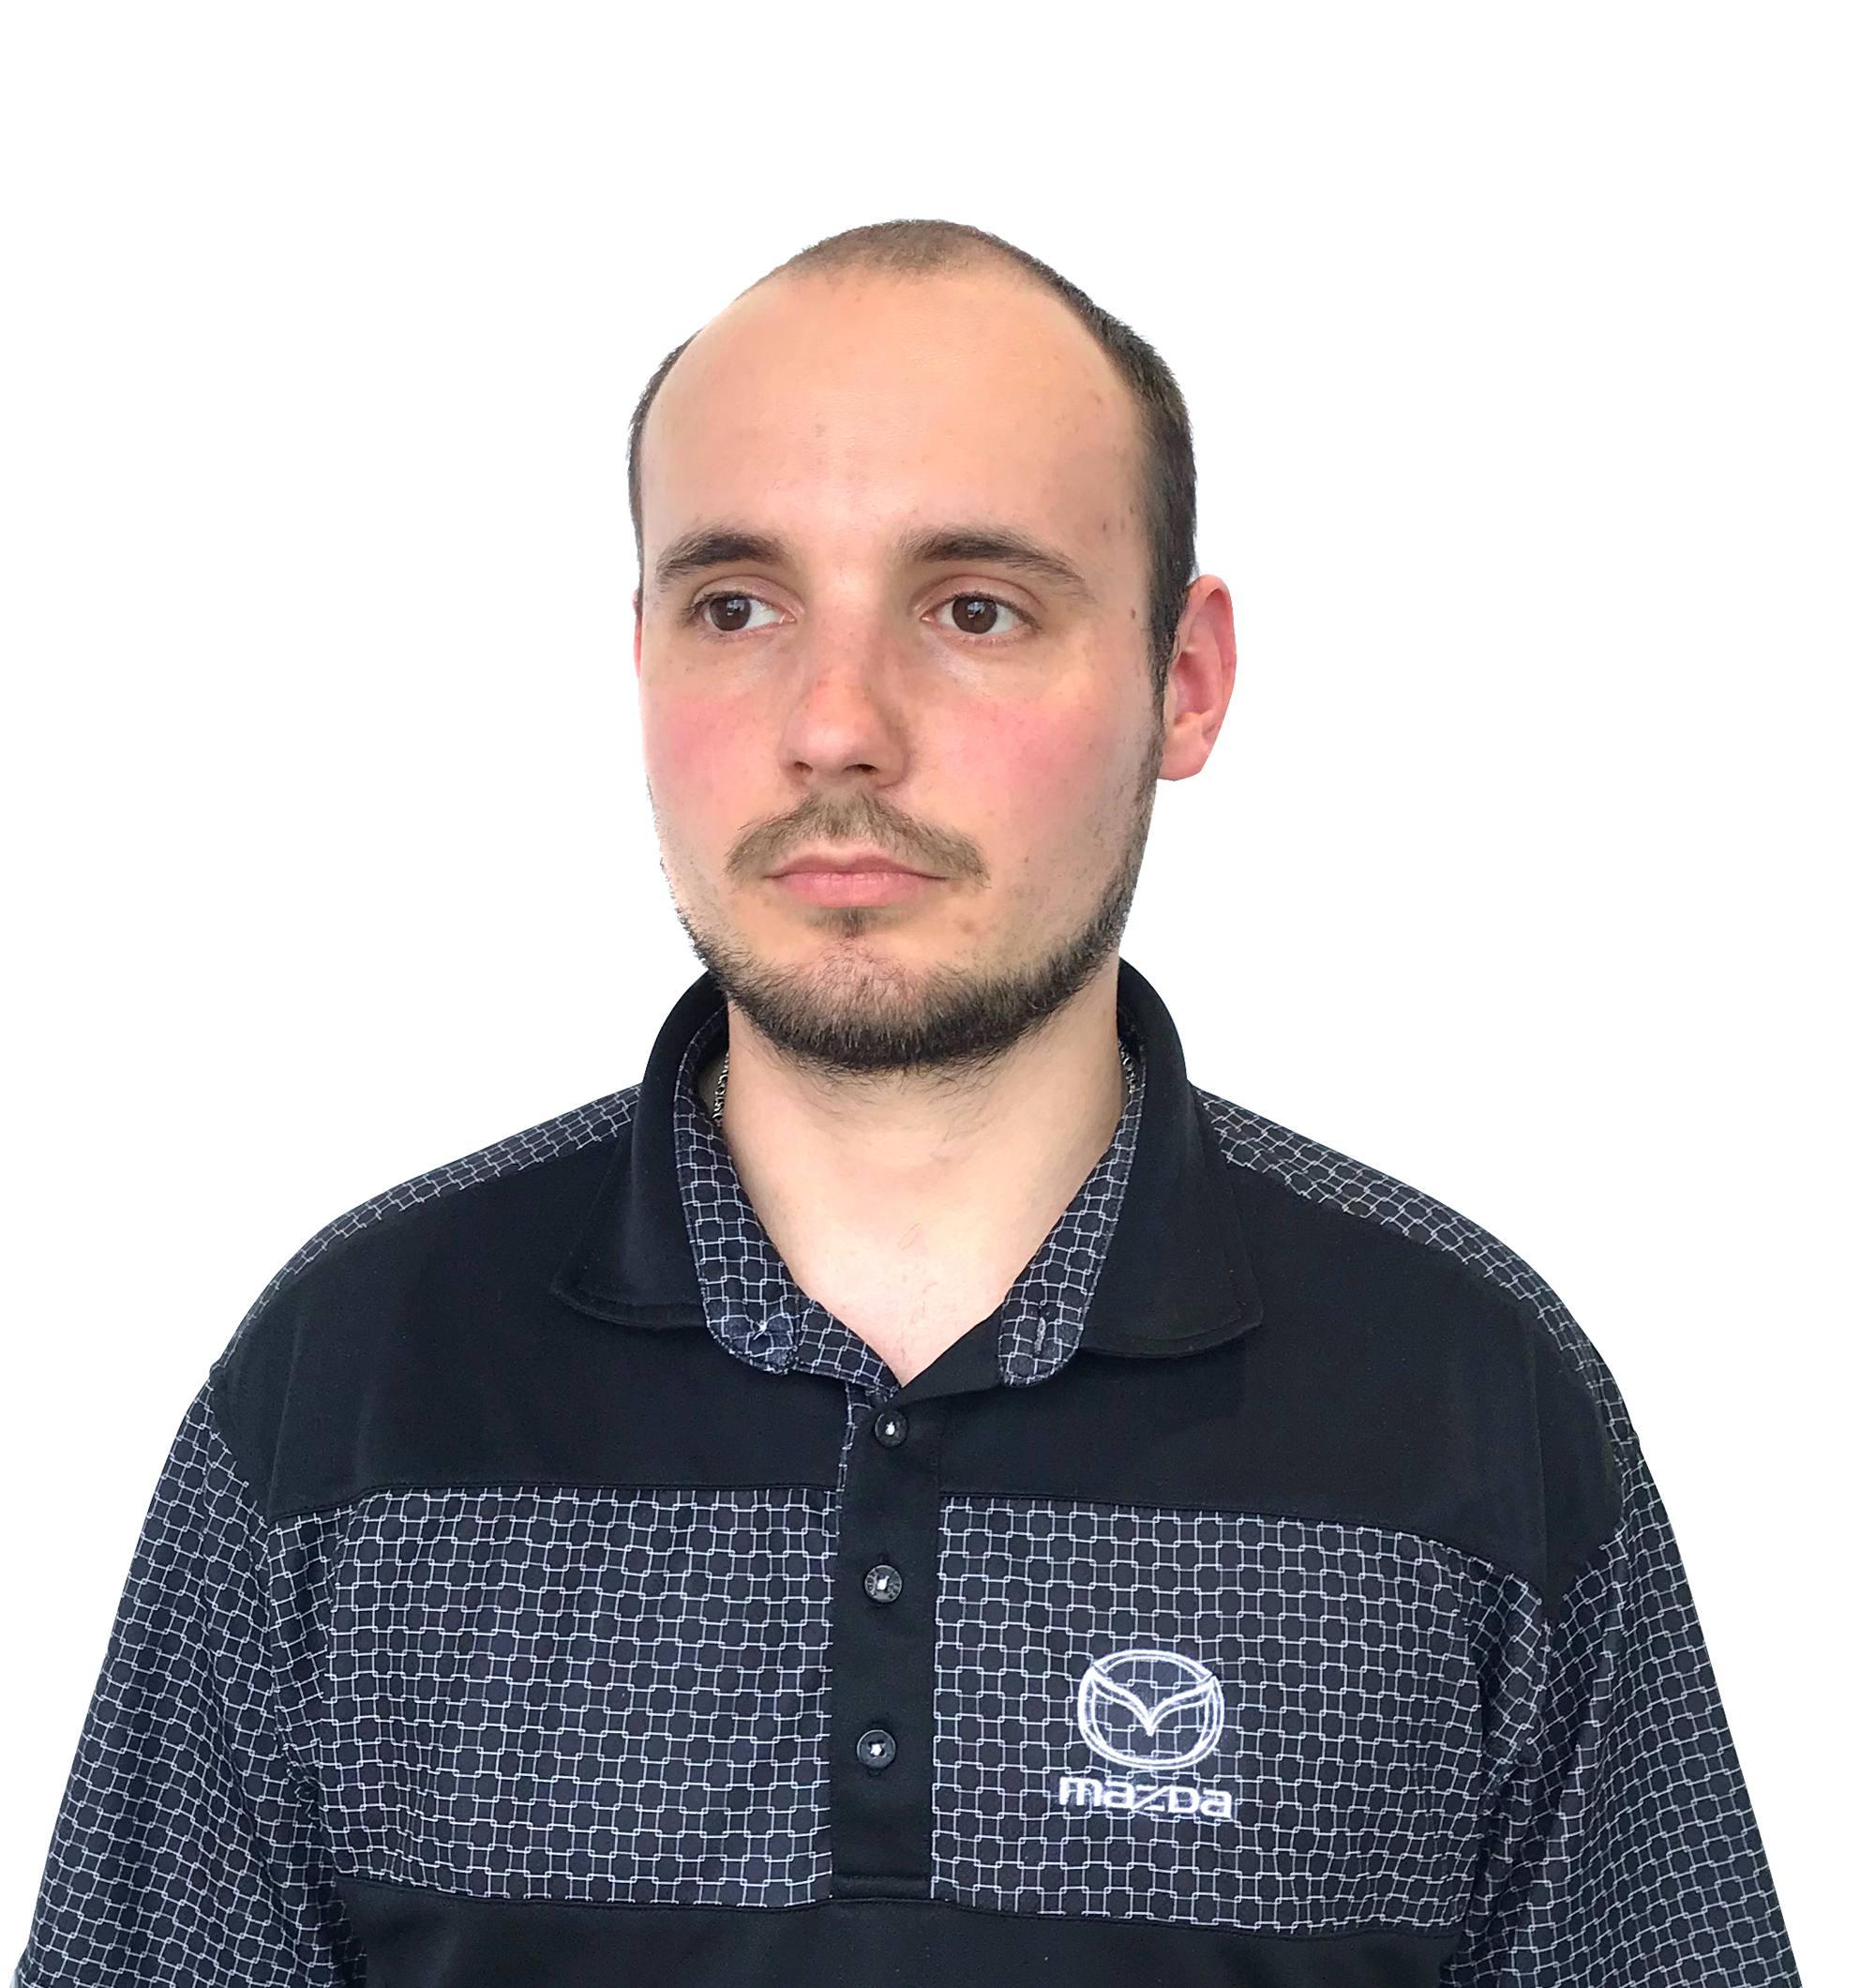 Paul Chernyavskyy